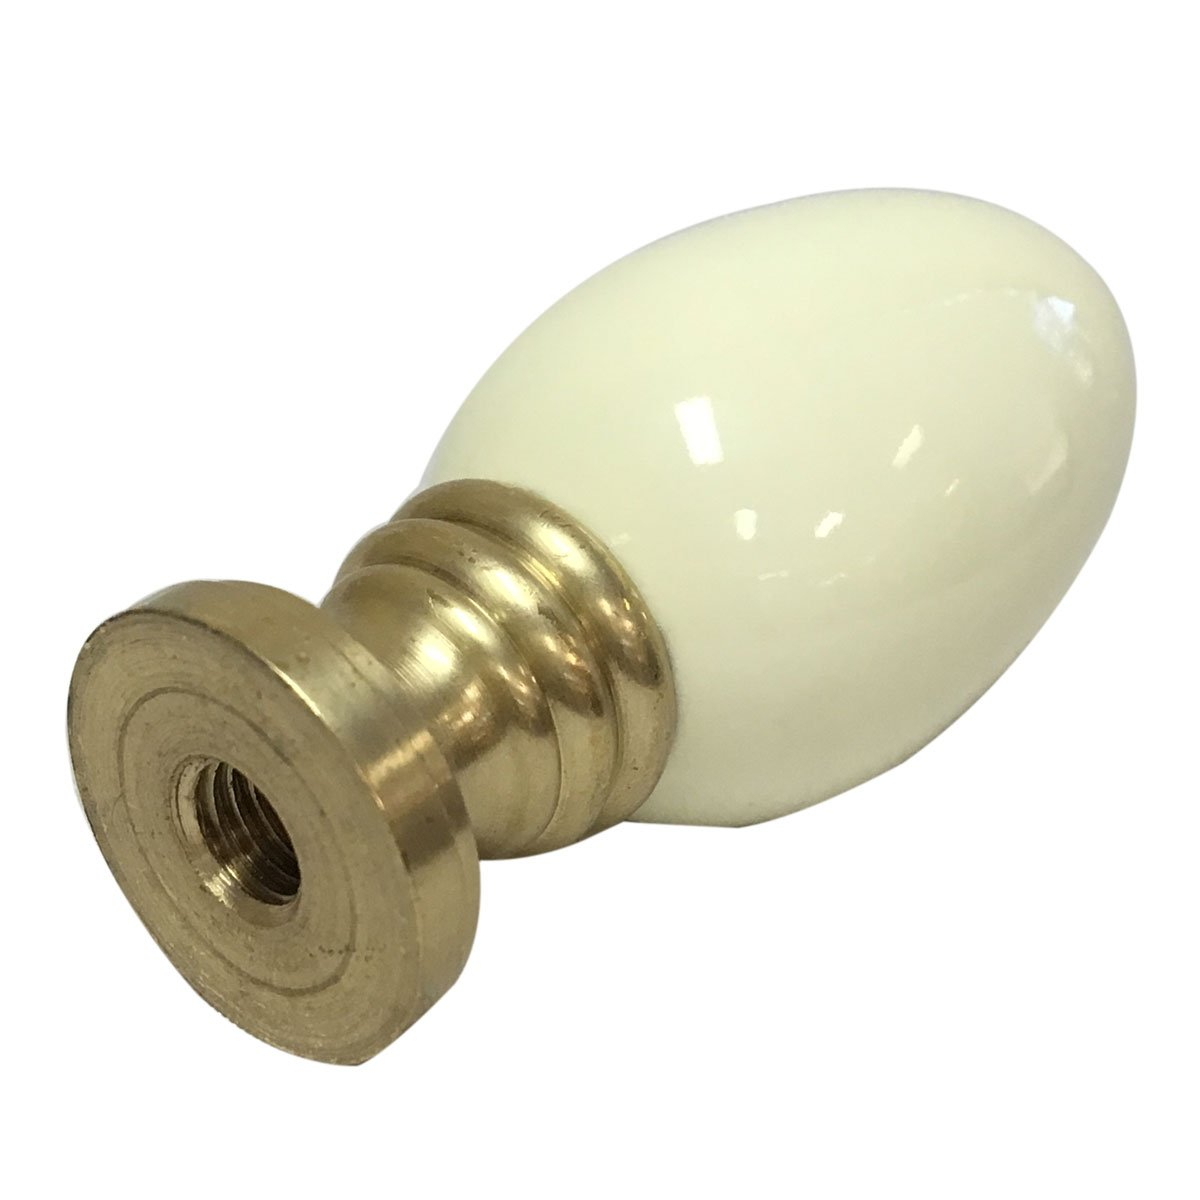 Royal Designs Ceramic Egg Shaped White Lamp Finial on Polished Brass Base